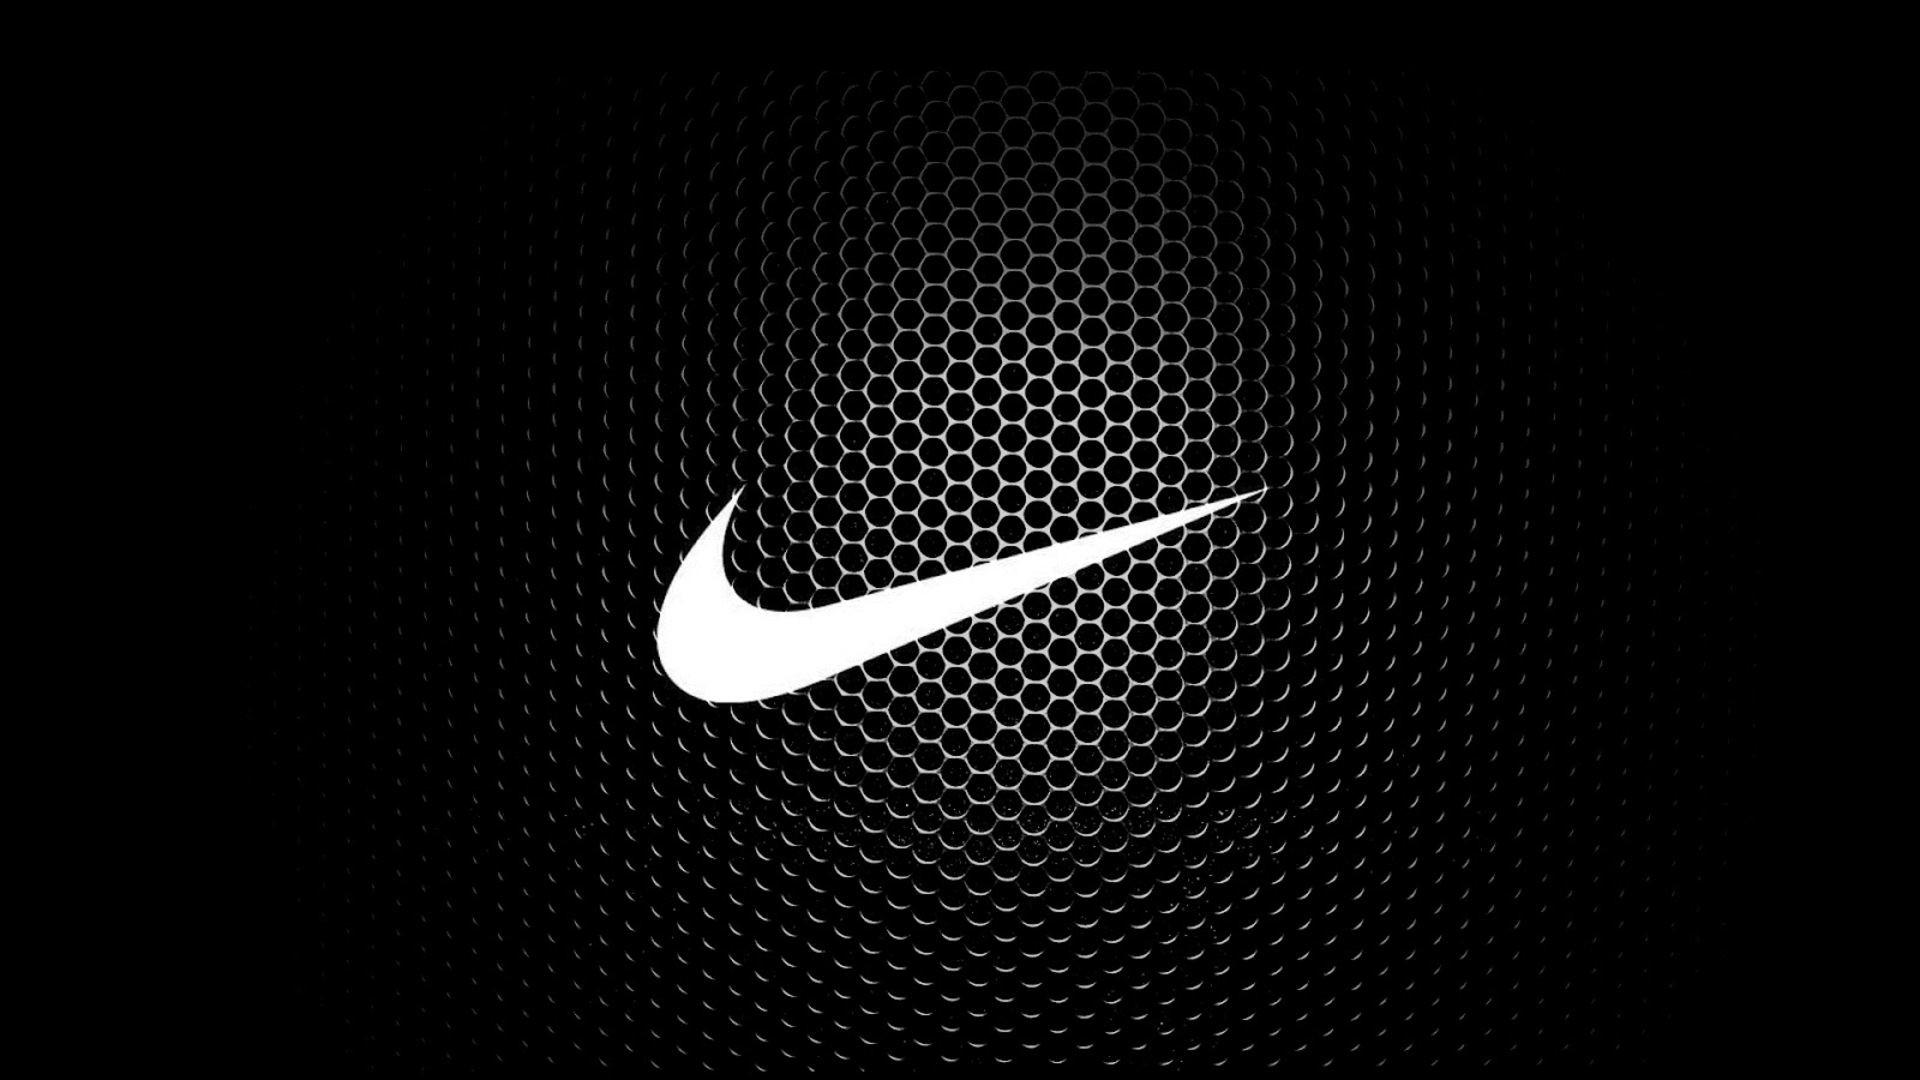 Nike Lebron Wallpaper 68 Images